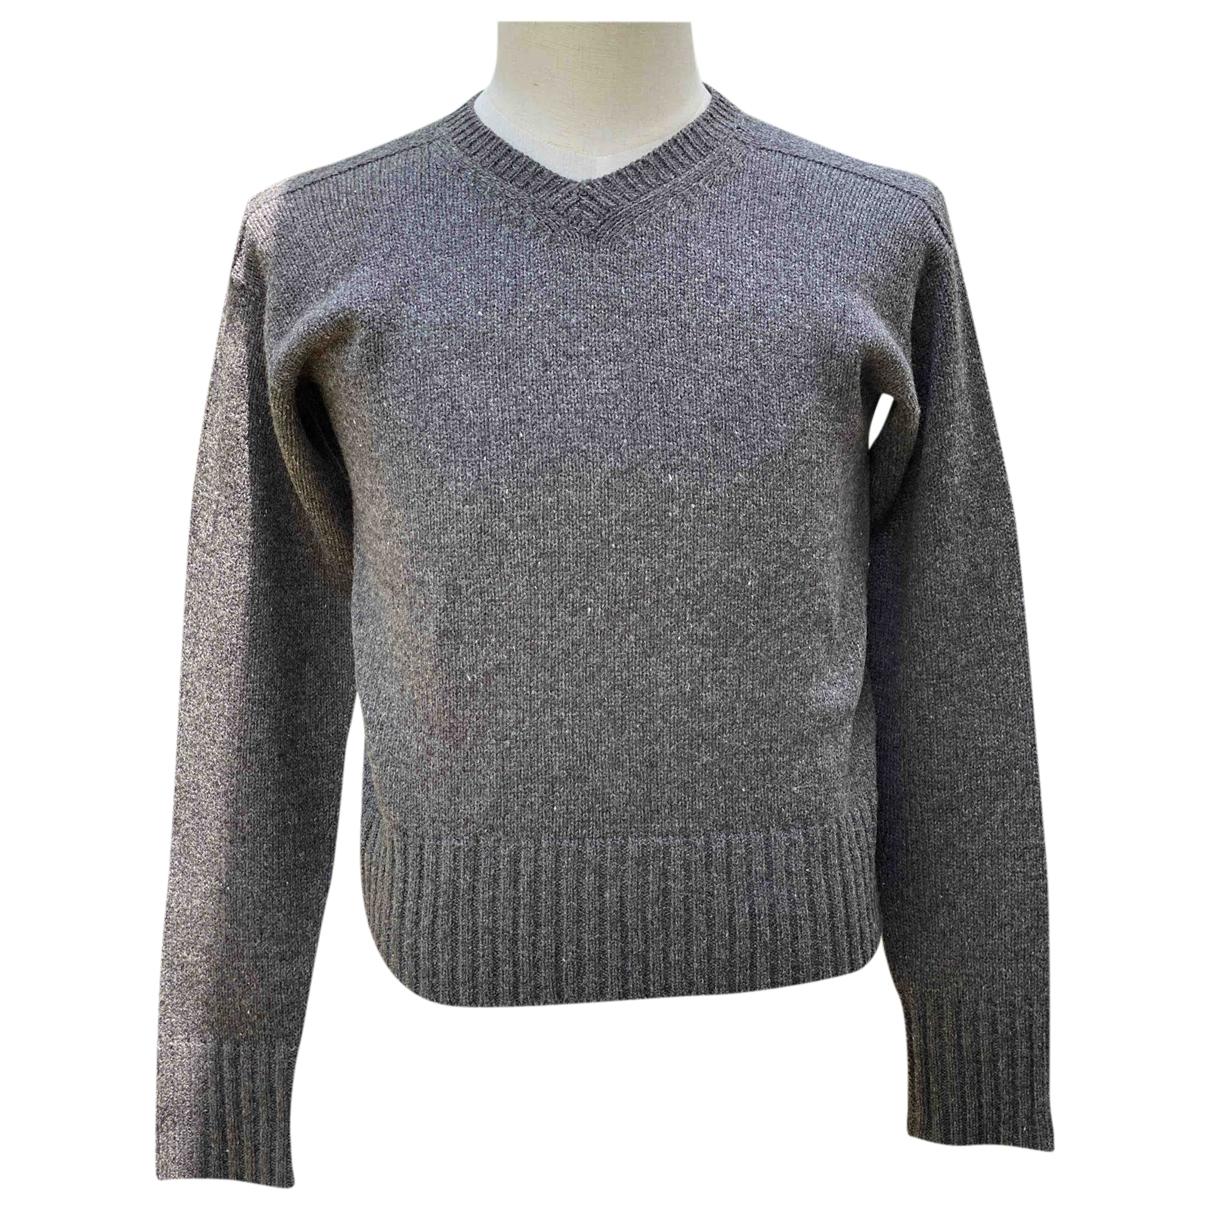 45rpm \N Grey Wool Knitwear & Sweatshirts for Men M International